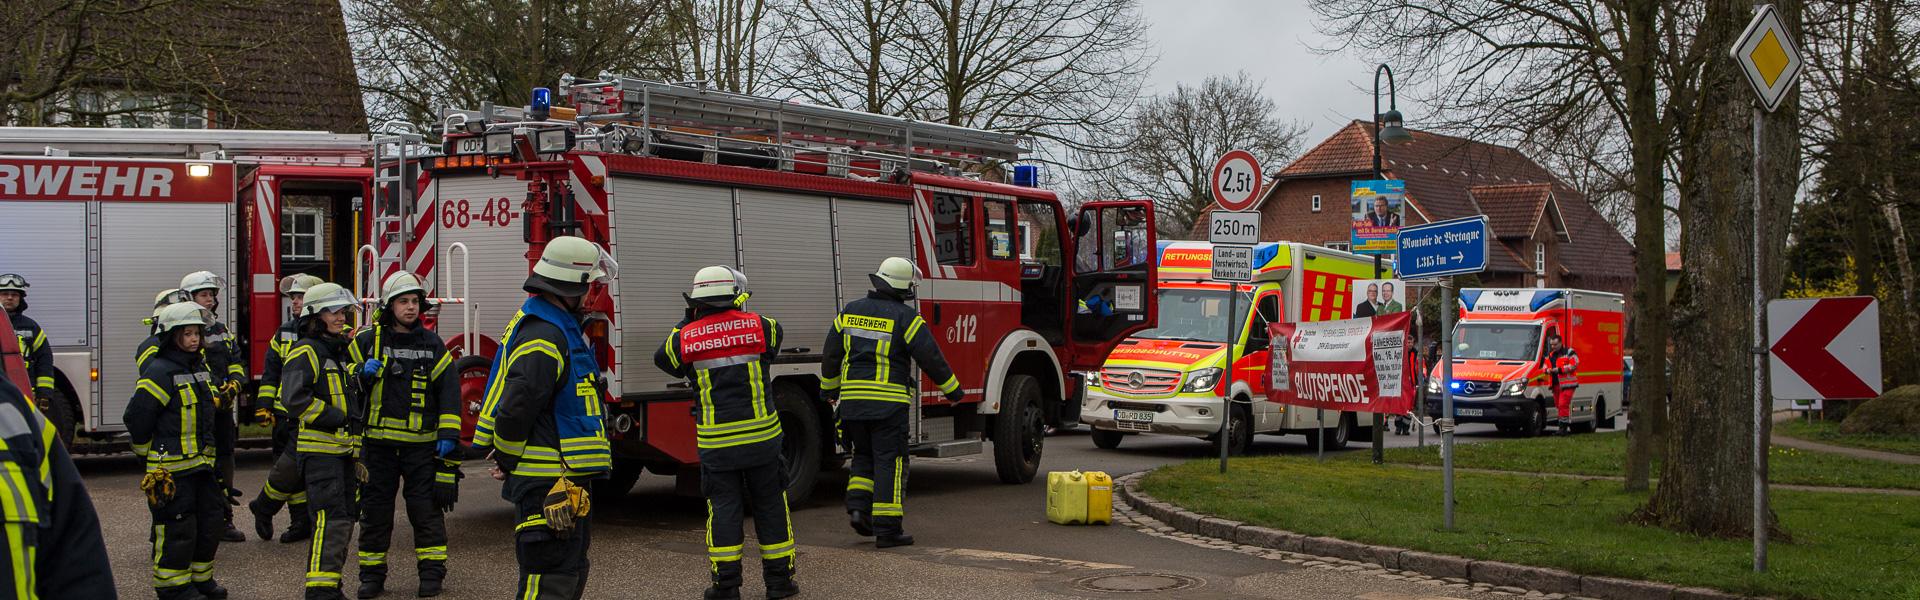 14.04.2018 – Verkehrsunfall in nasser Kurve in Bünningstedt